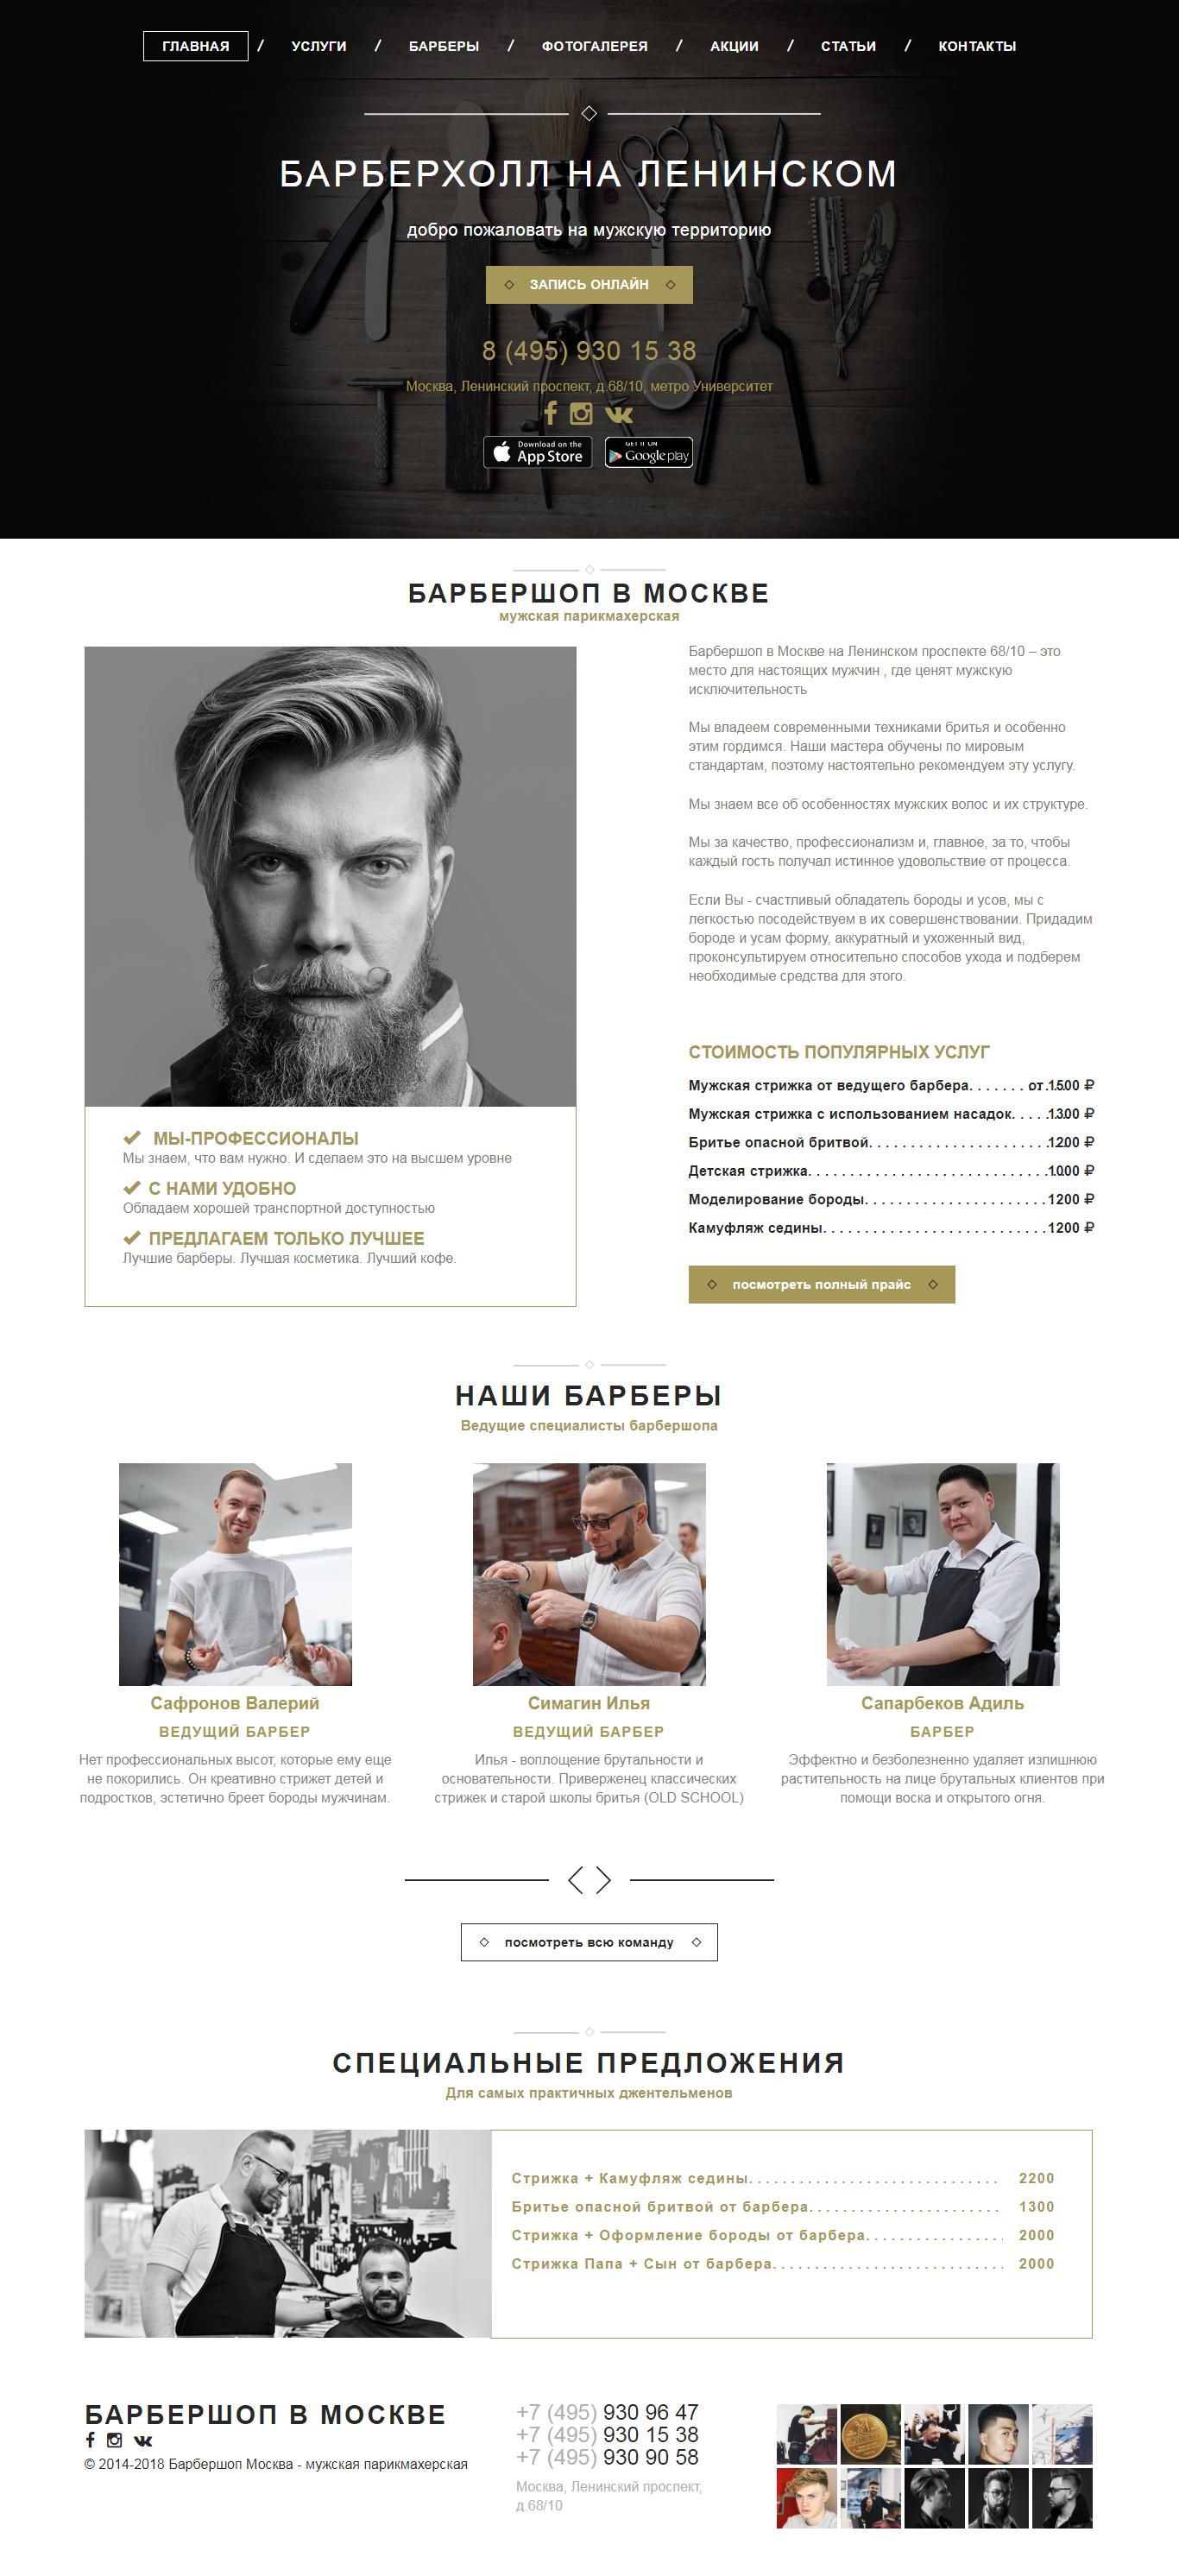 Website: http://barber-hall.ru/. Date of access: 06/09/2018